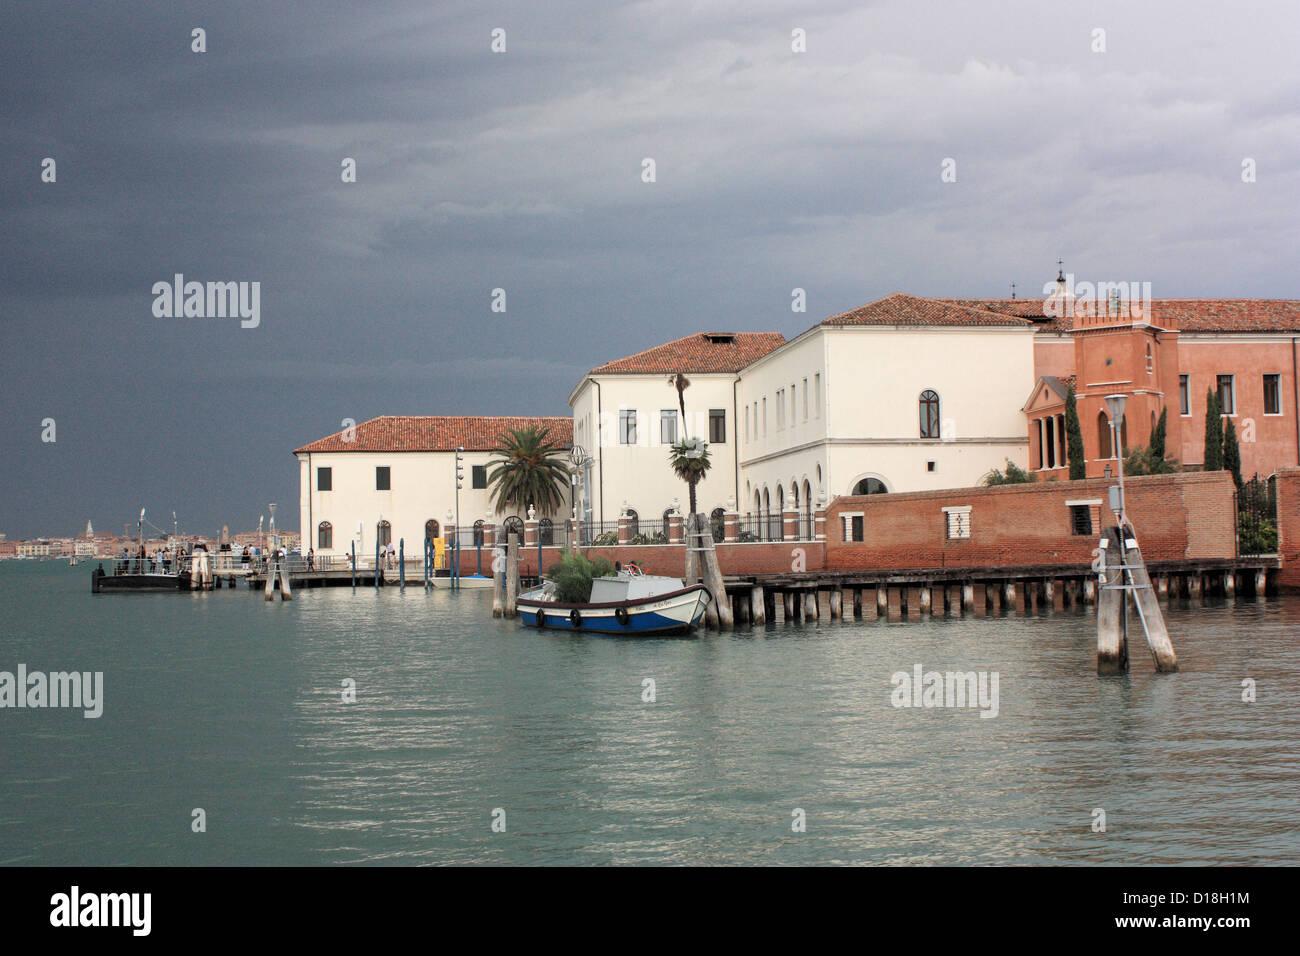 Isola di San Servolo Island Stock Photo